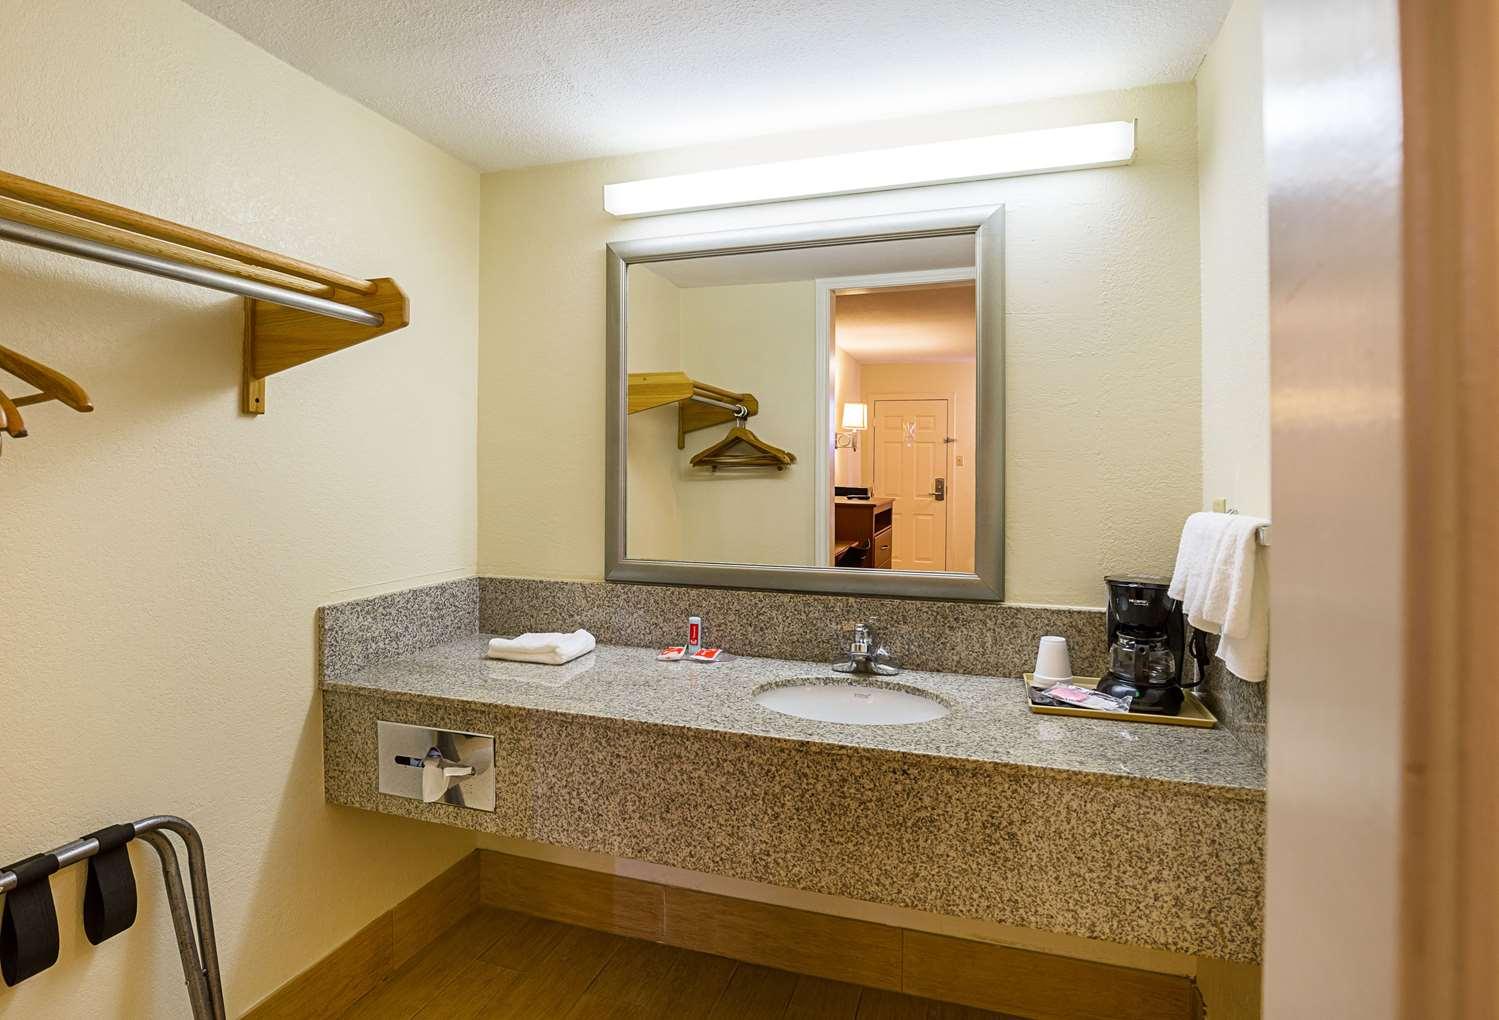 Bathroom in guest room